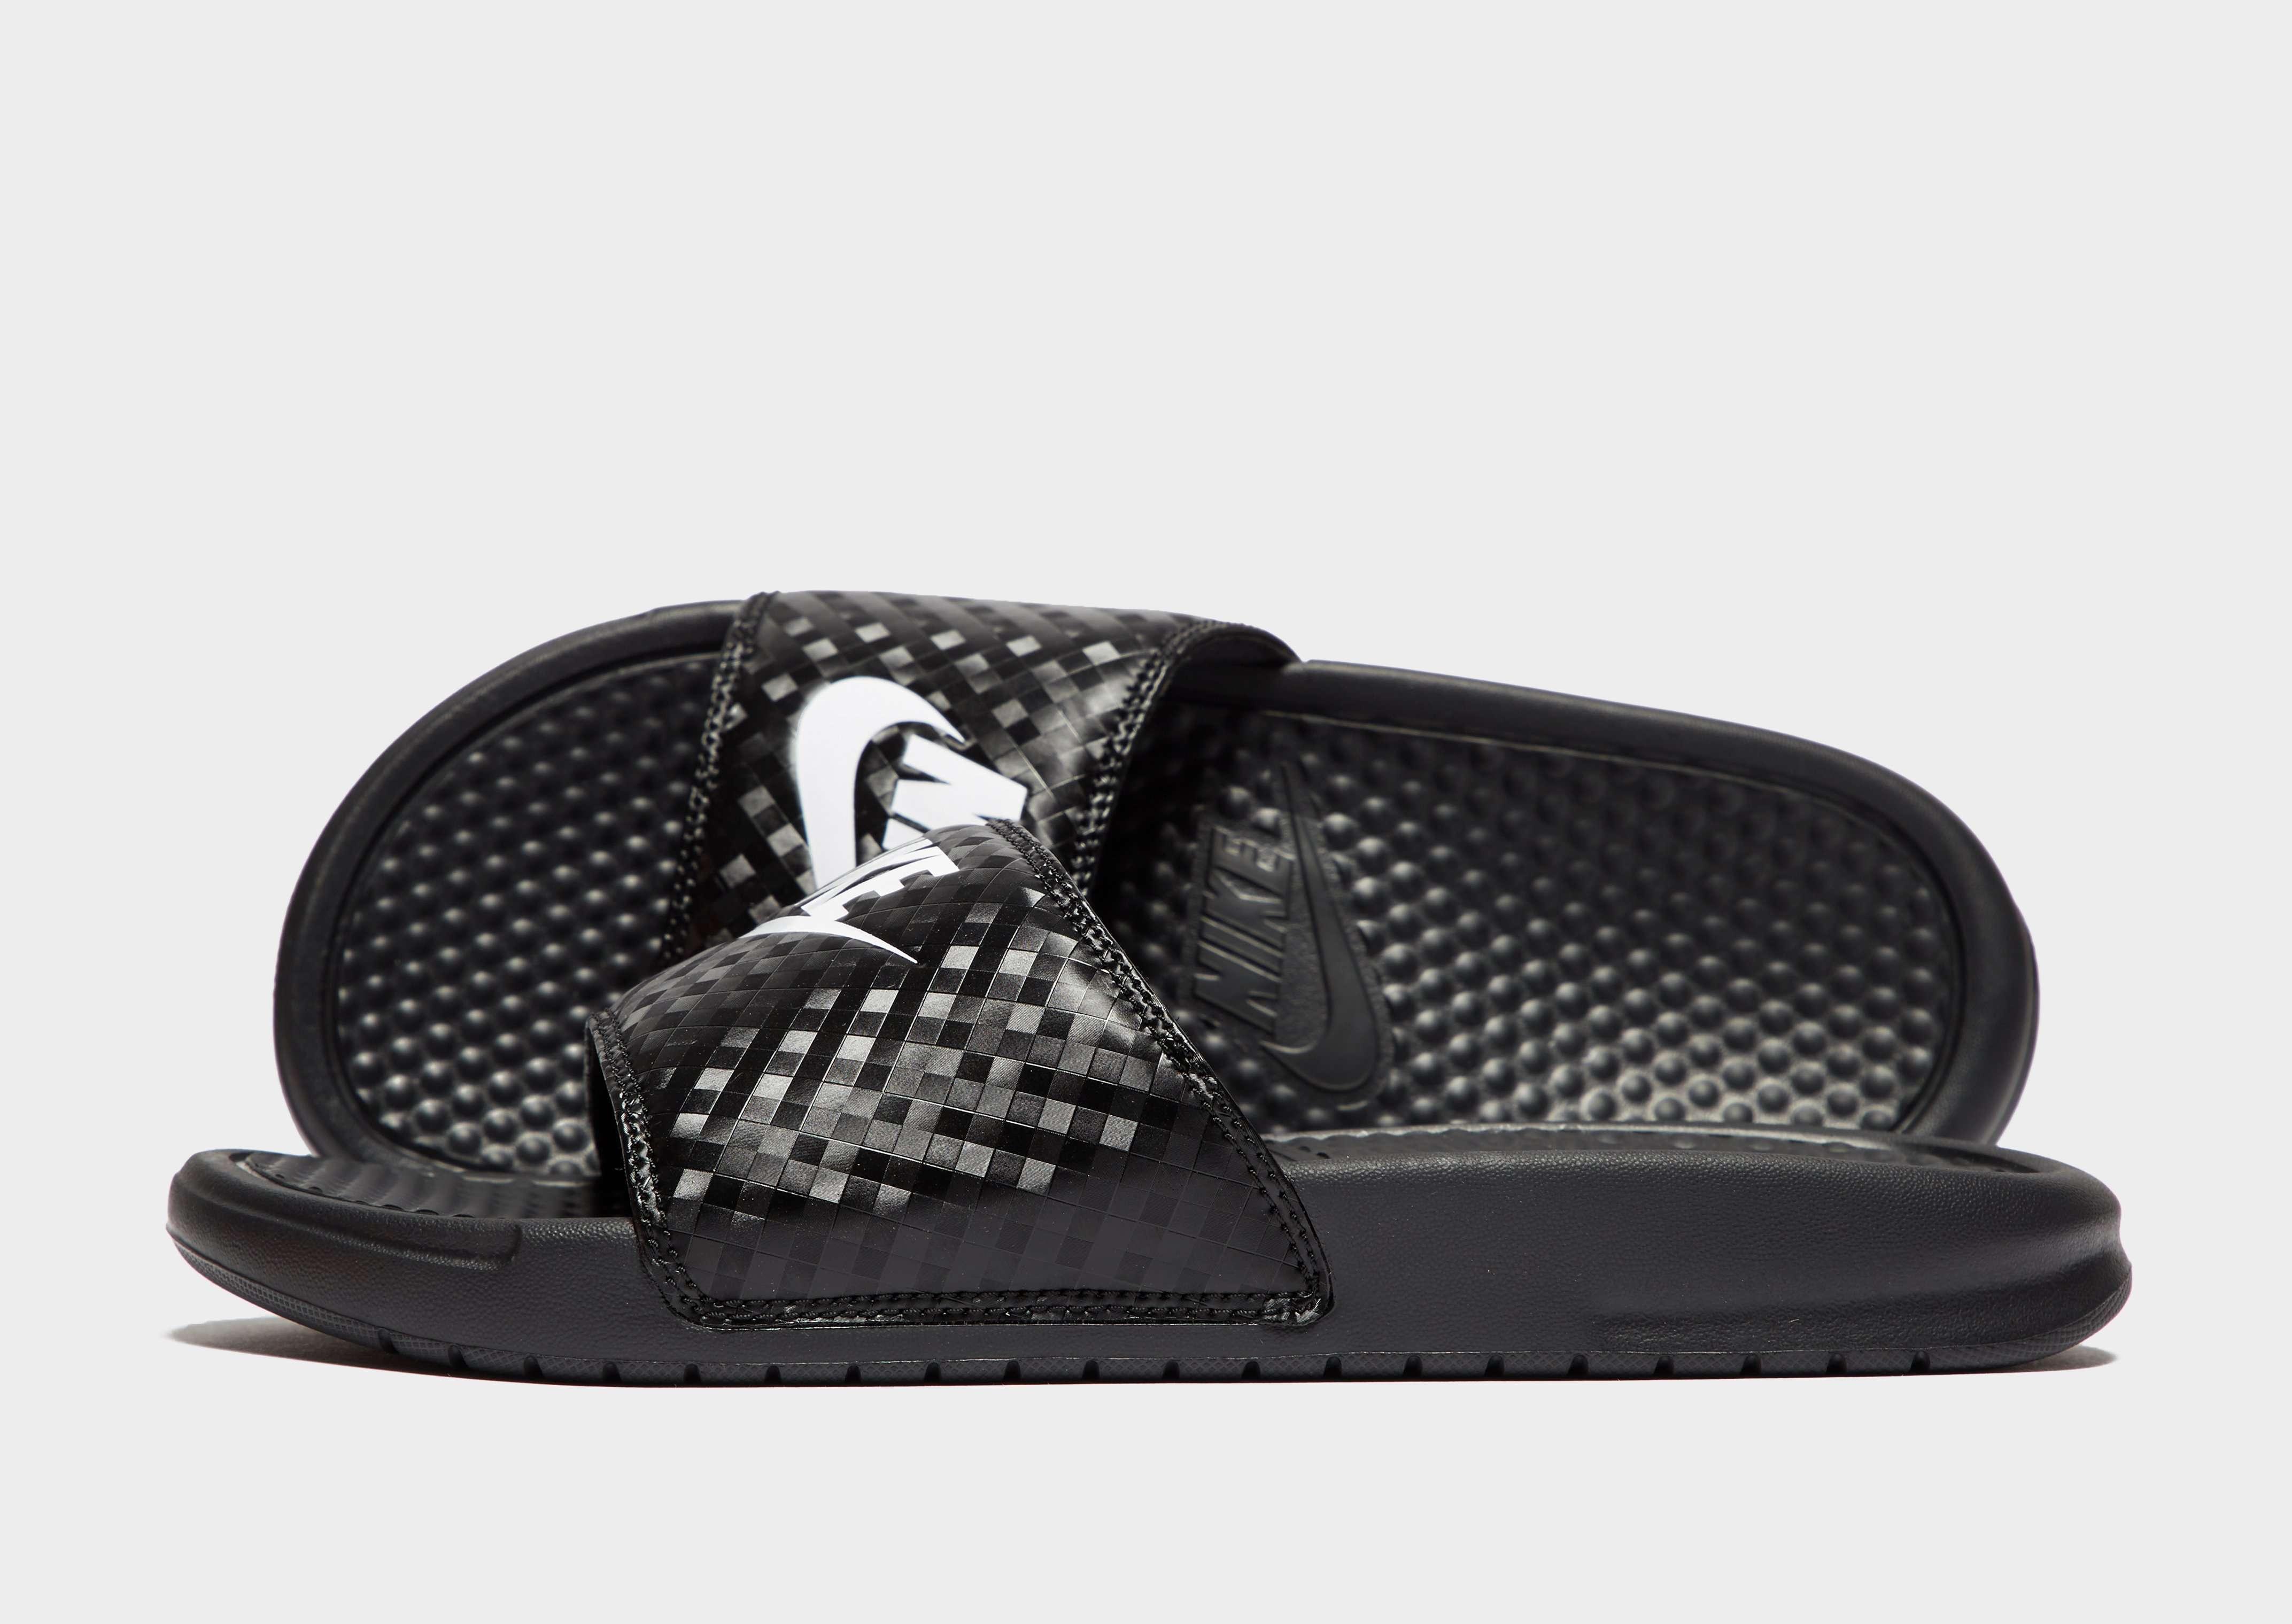 nike benassi taille 37,Nike Benassi JDI Slide Femmes Casual